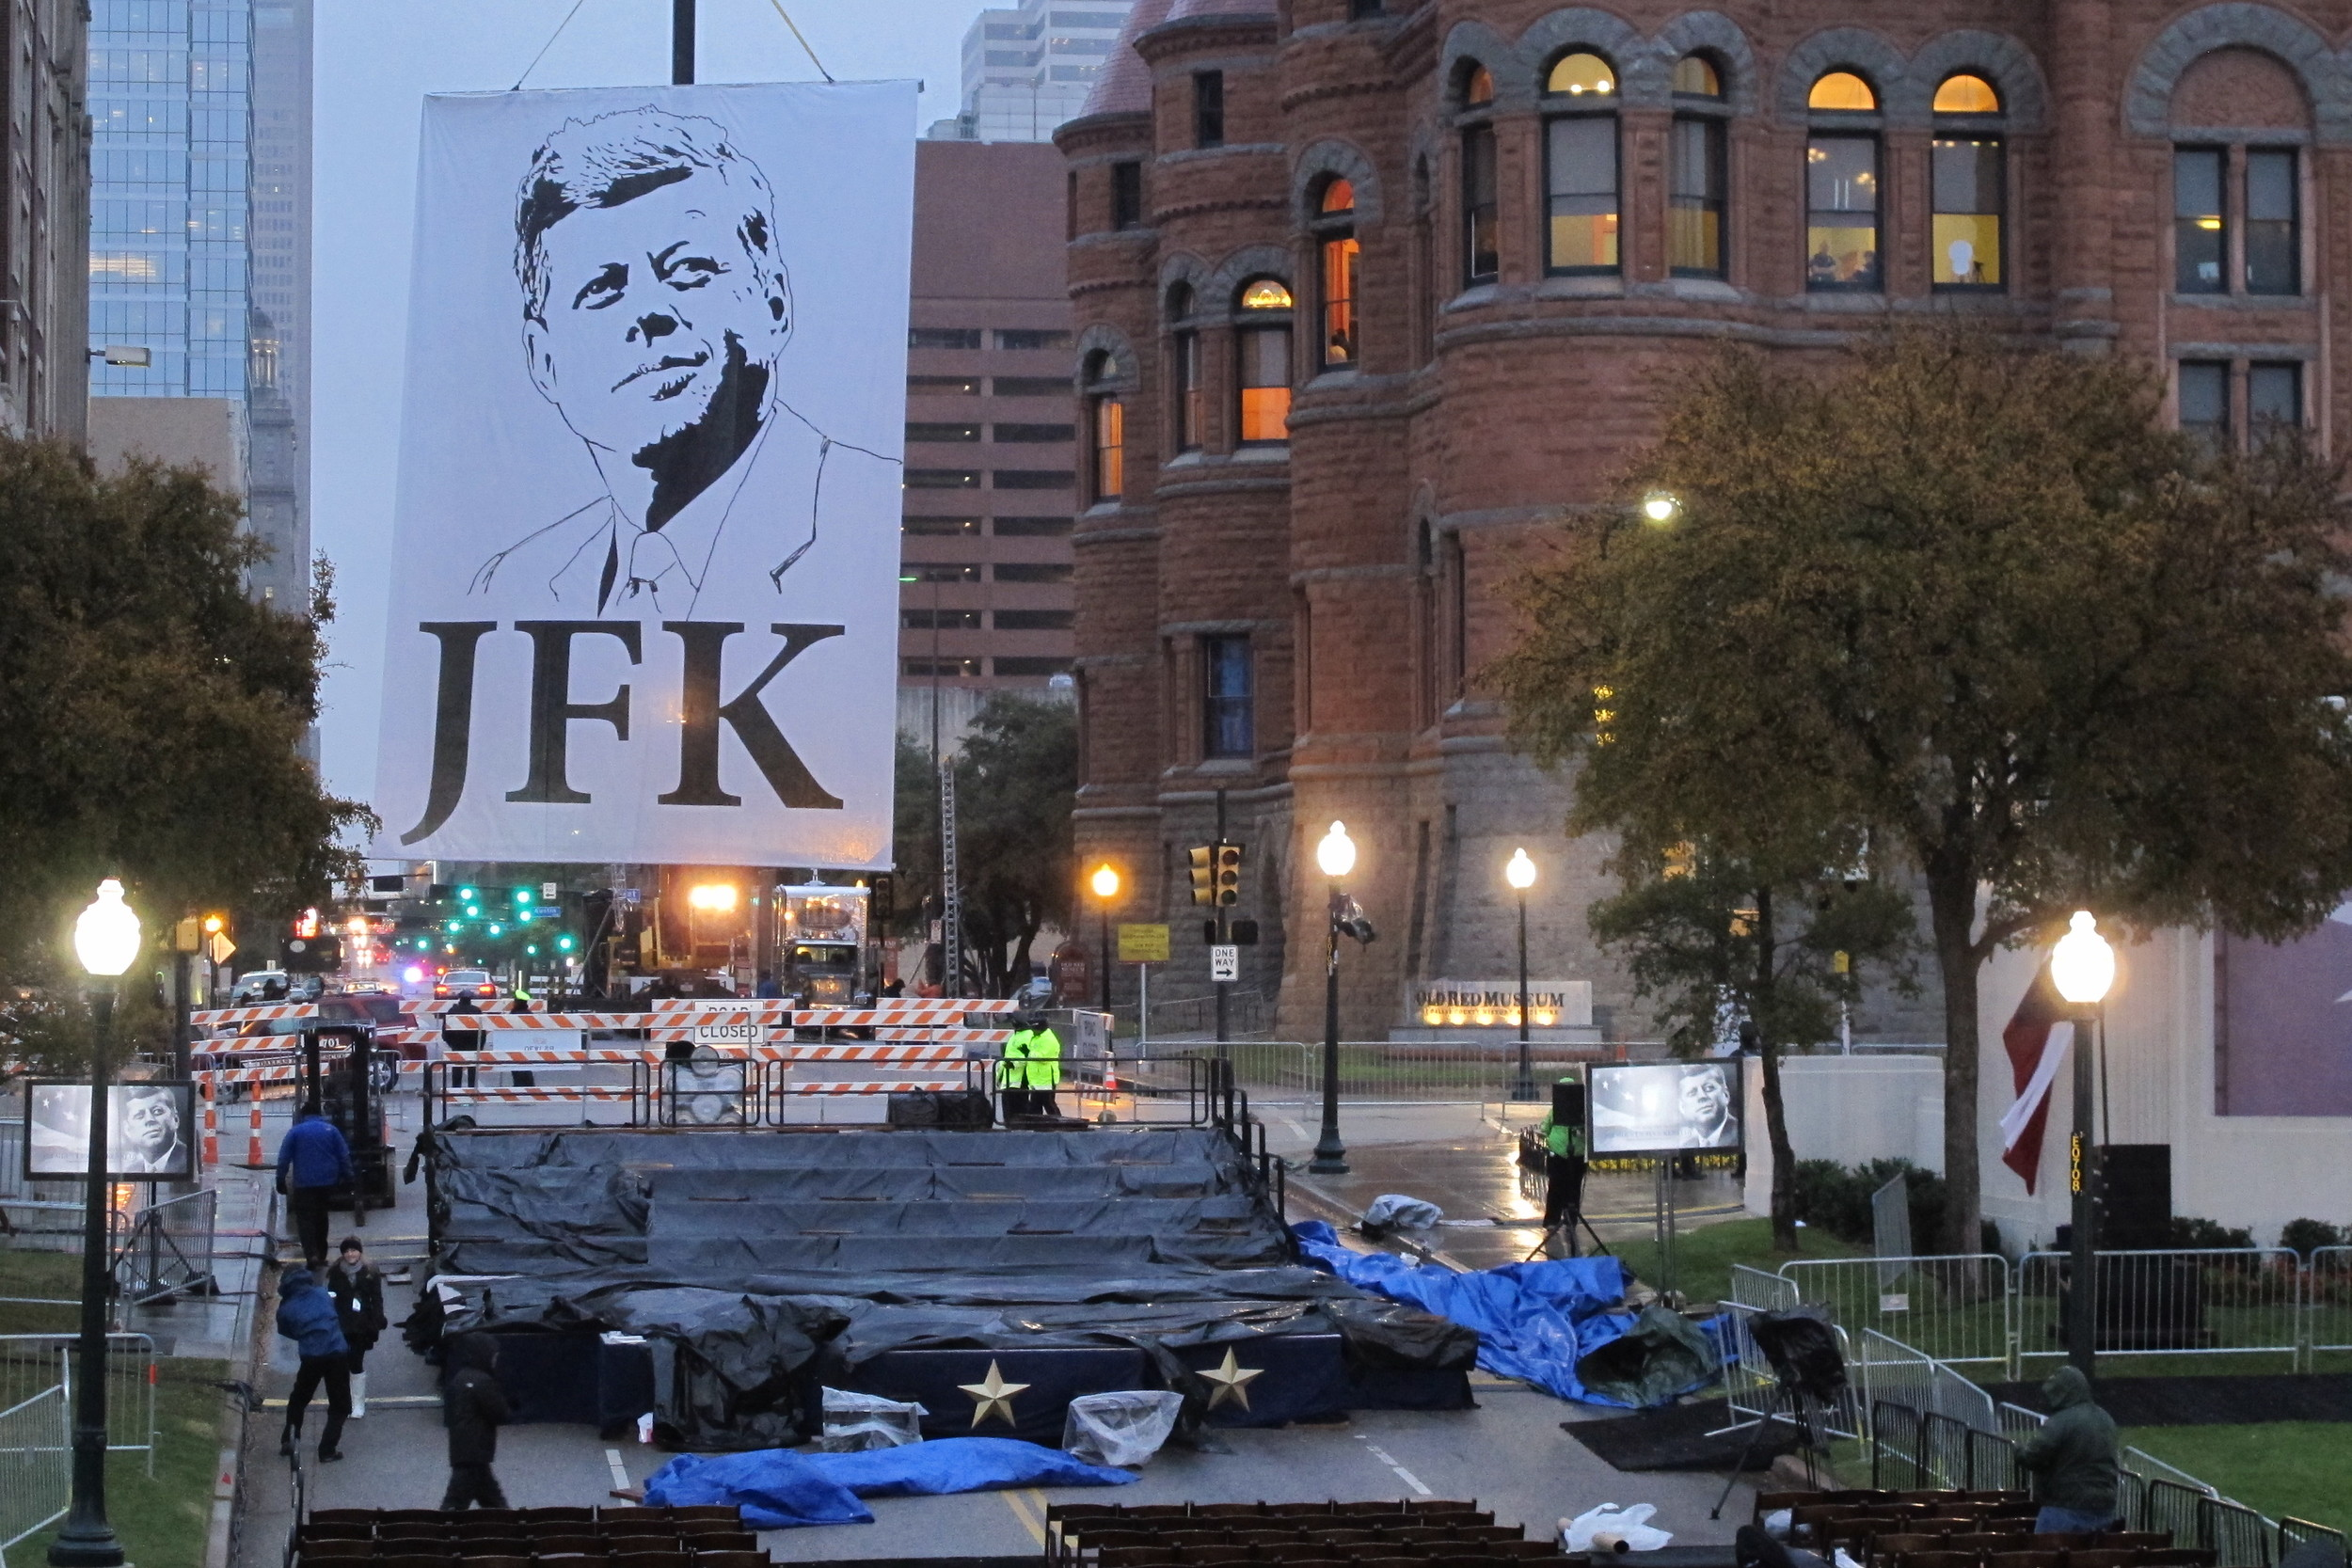 jfk-banner-7a.jpg